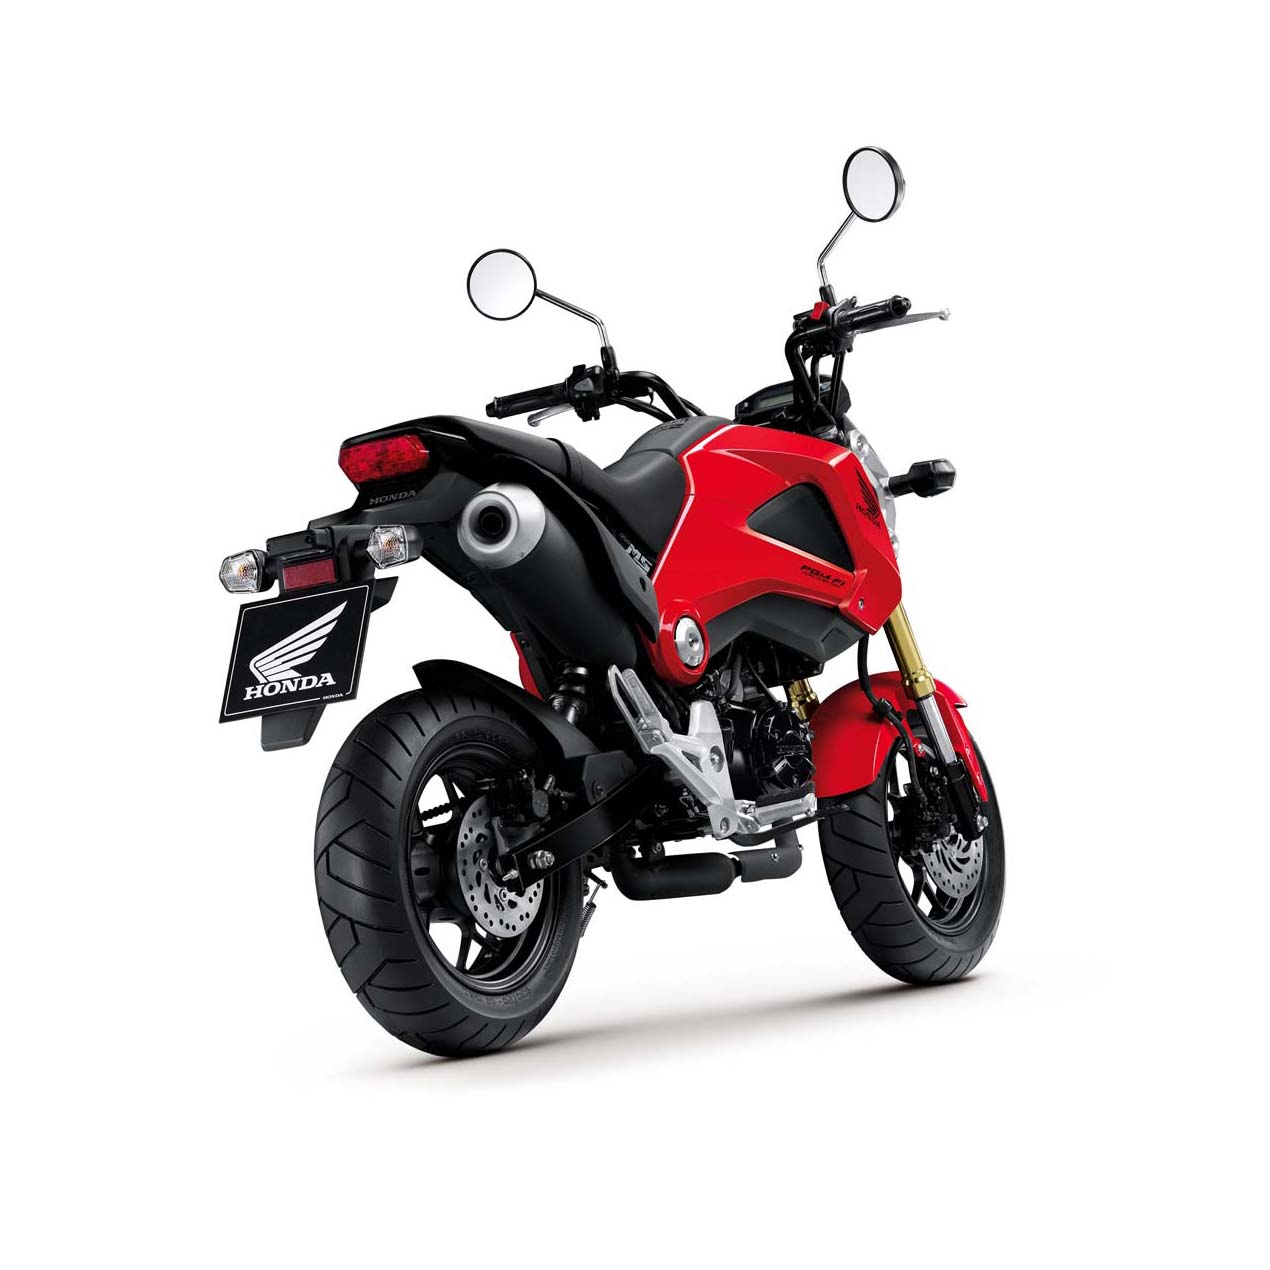 Say Hello to the 2013 Honda...Grom? - Asphalt & Rubber